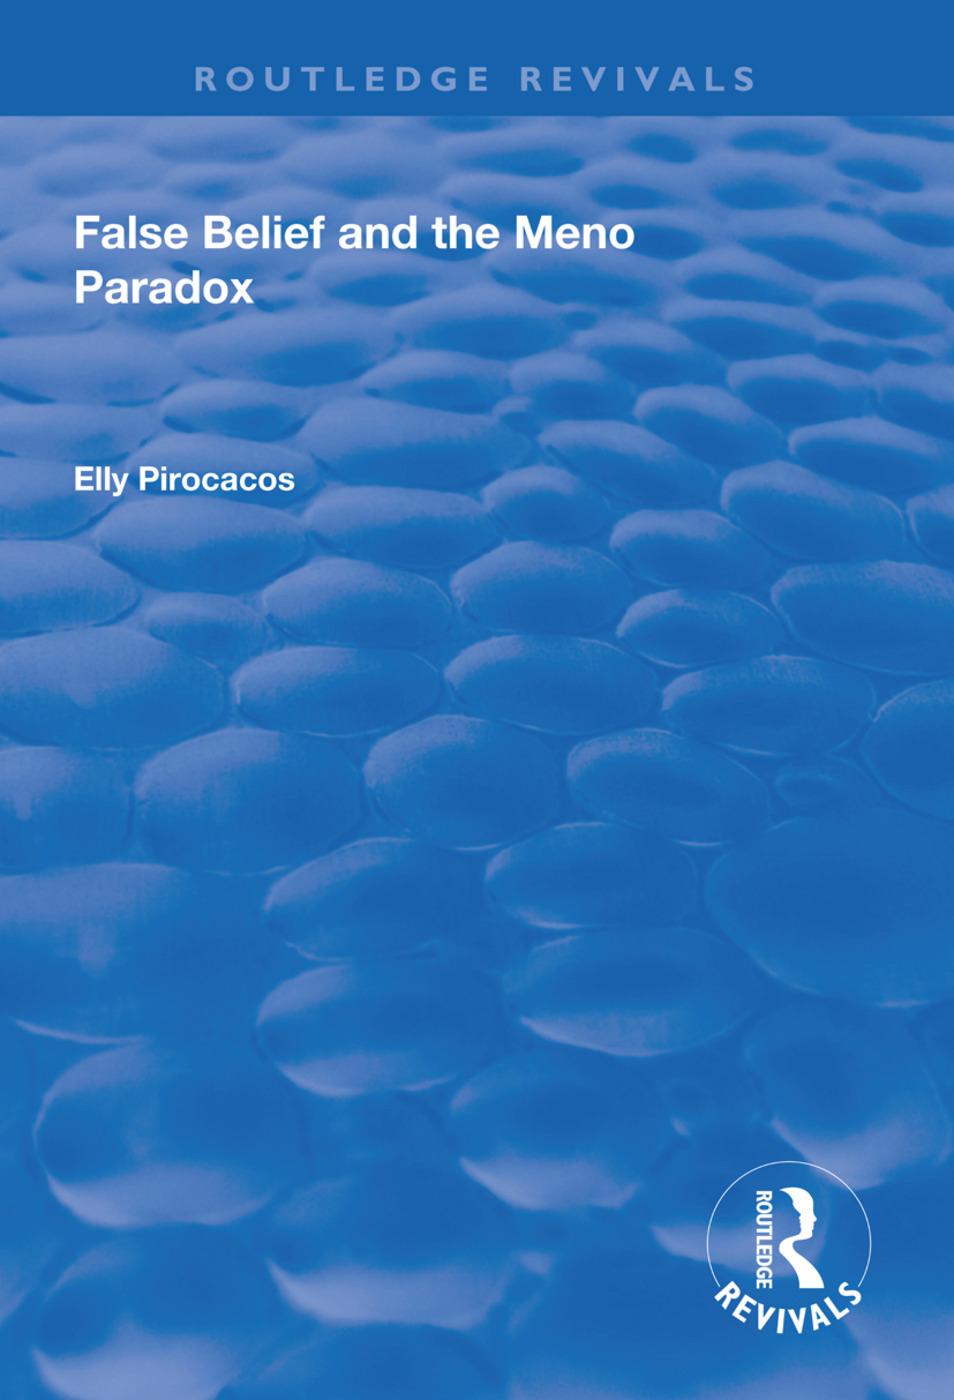 False Belief and the Meno Paradox